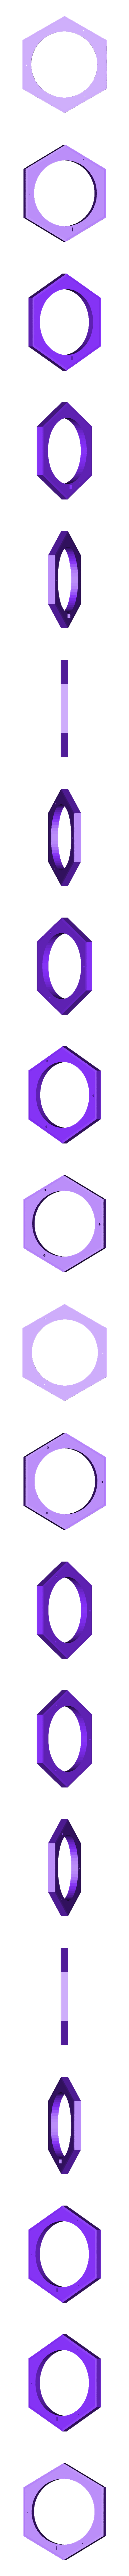 BoltNutTensegrity_top.stl Télécharger fichier STL gratuit BoltNut-Tensegrity • Modèle à imprimer en 3D, Seabird